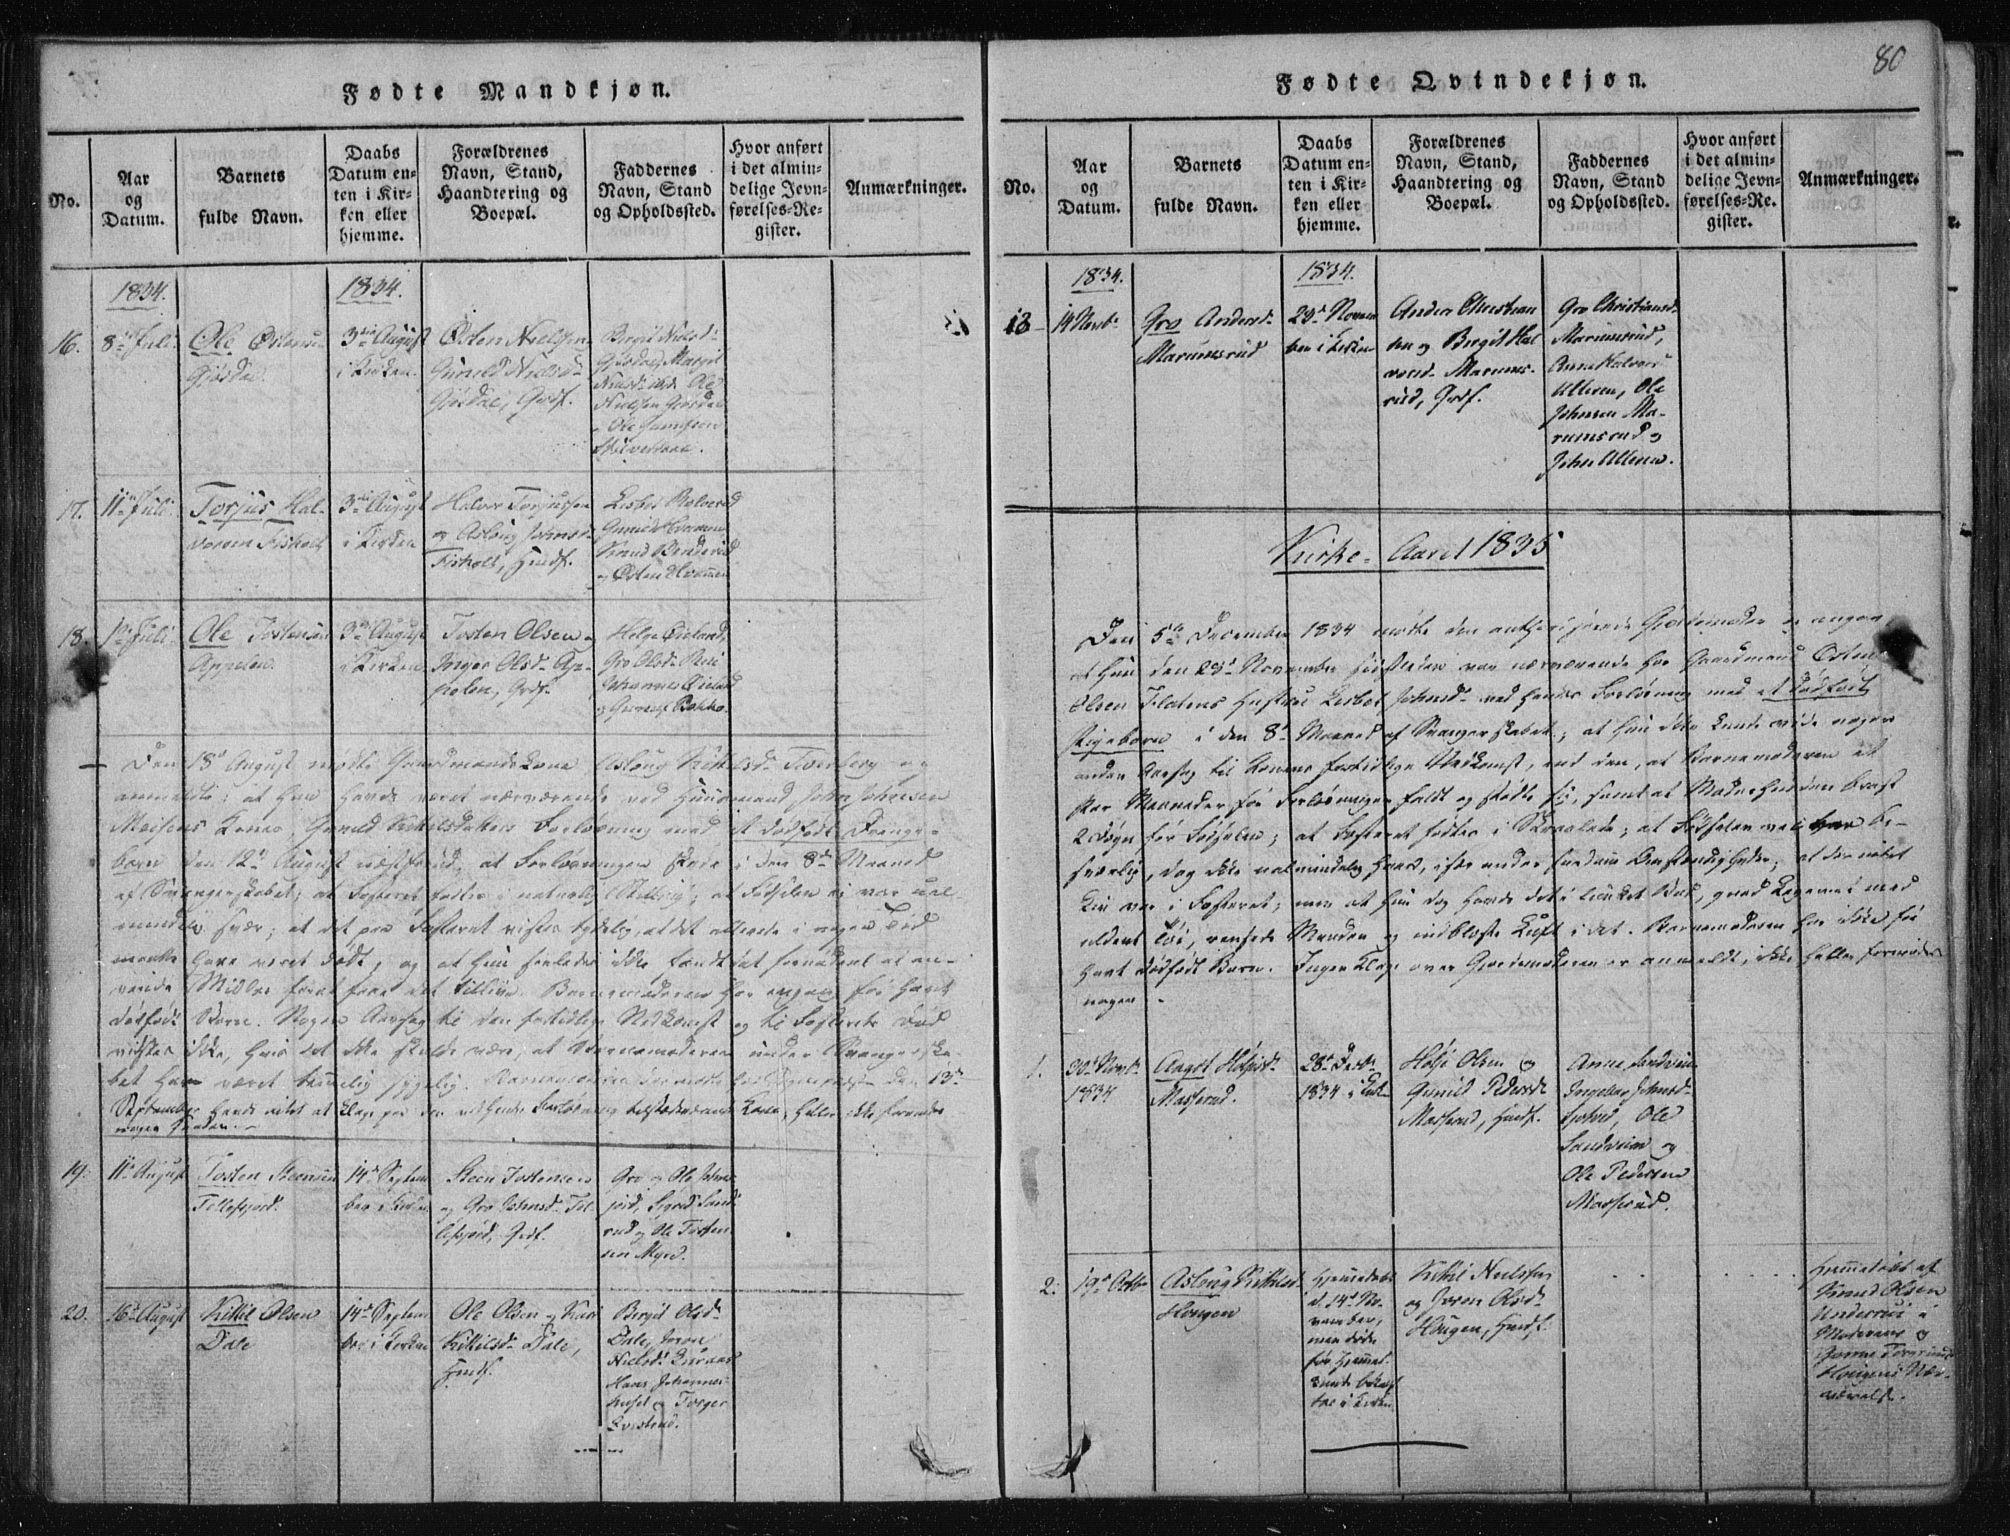 SAKO, Tinn kirkebøker, F/Fa/L0004: Ministerialbok nr. I 4, 1815-1843, s. 80